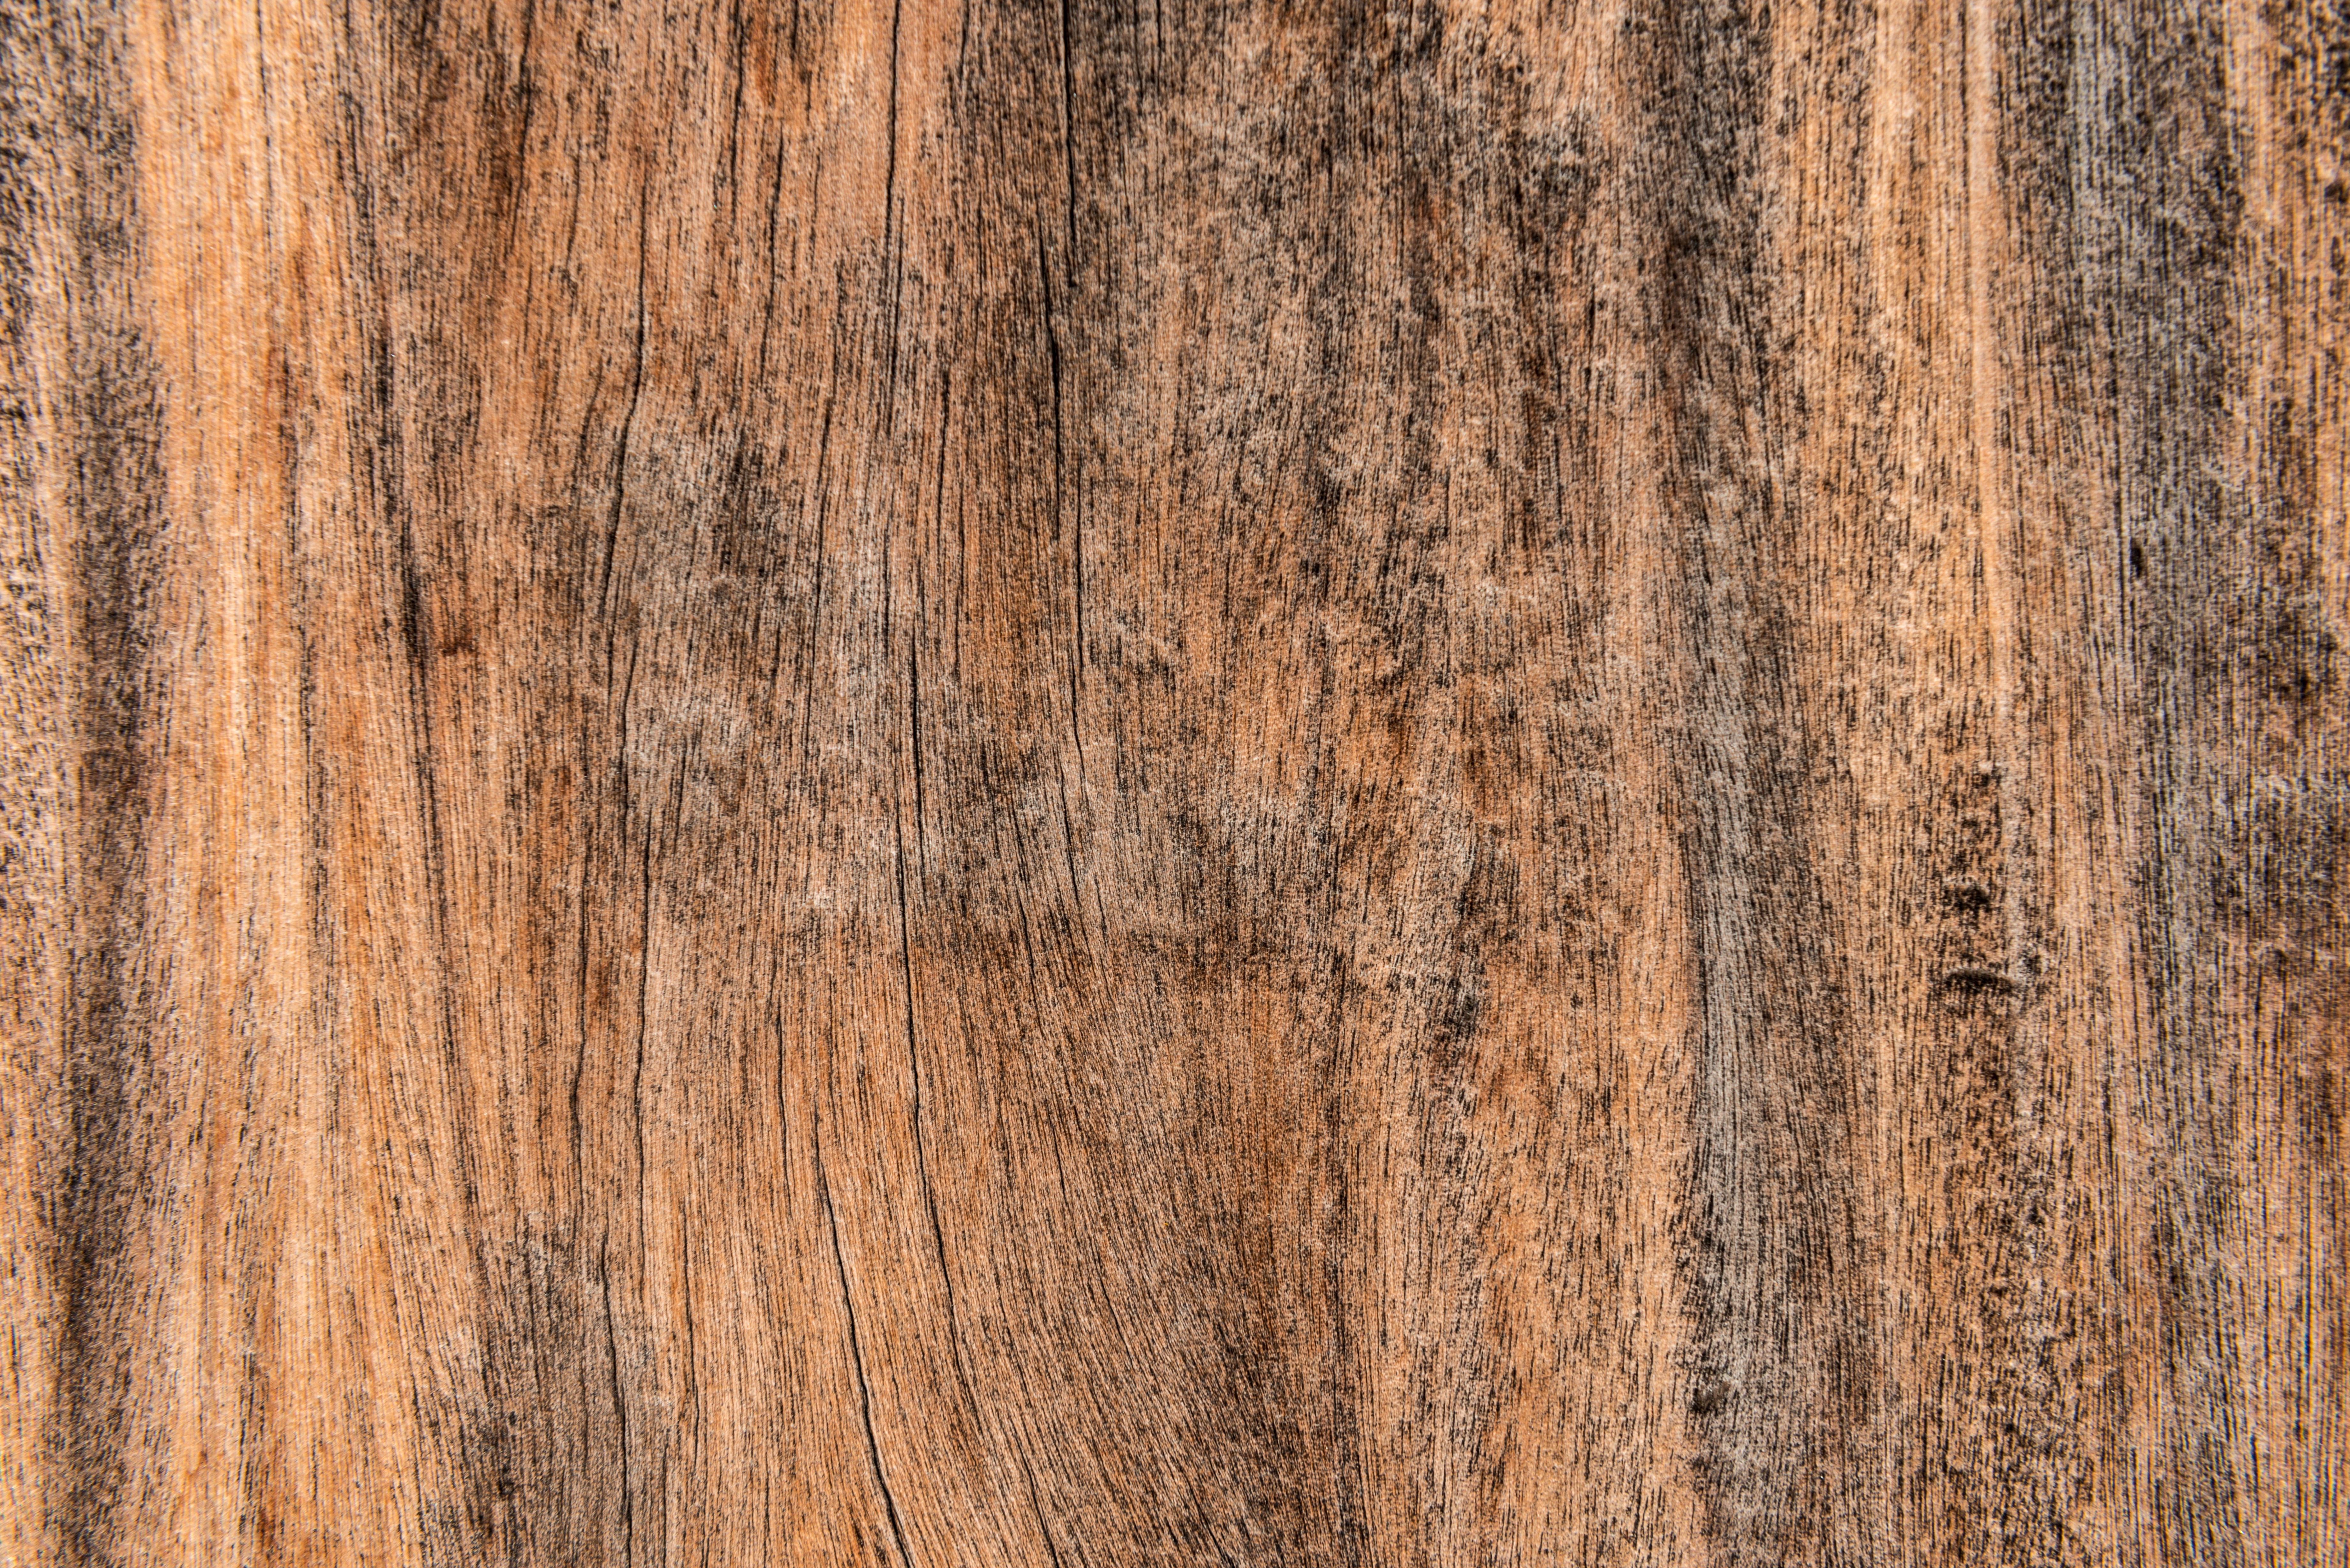 tree texture, tree texture